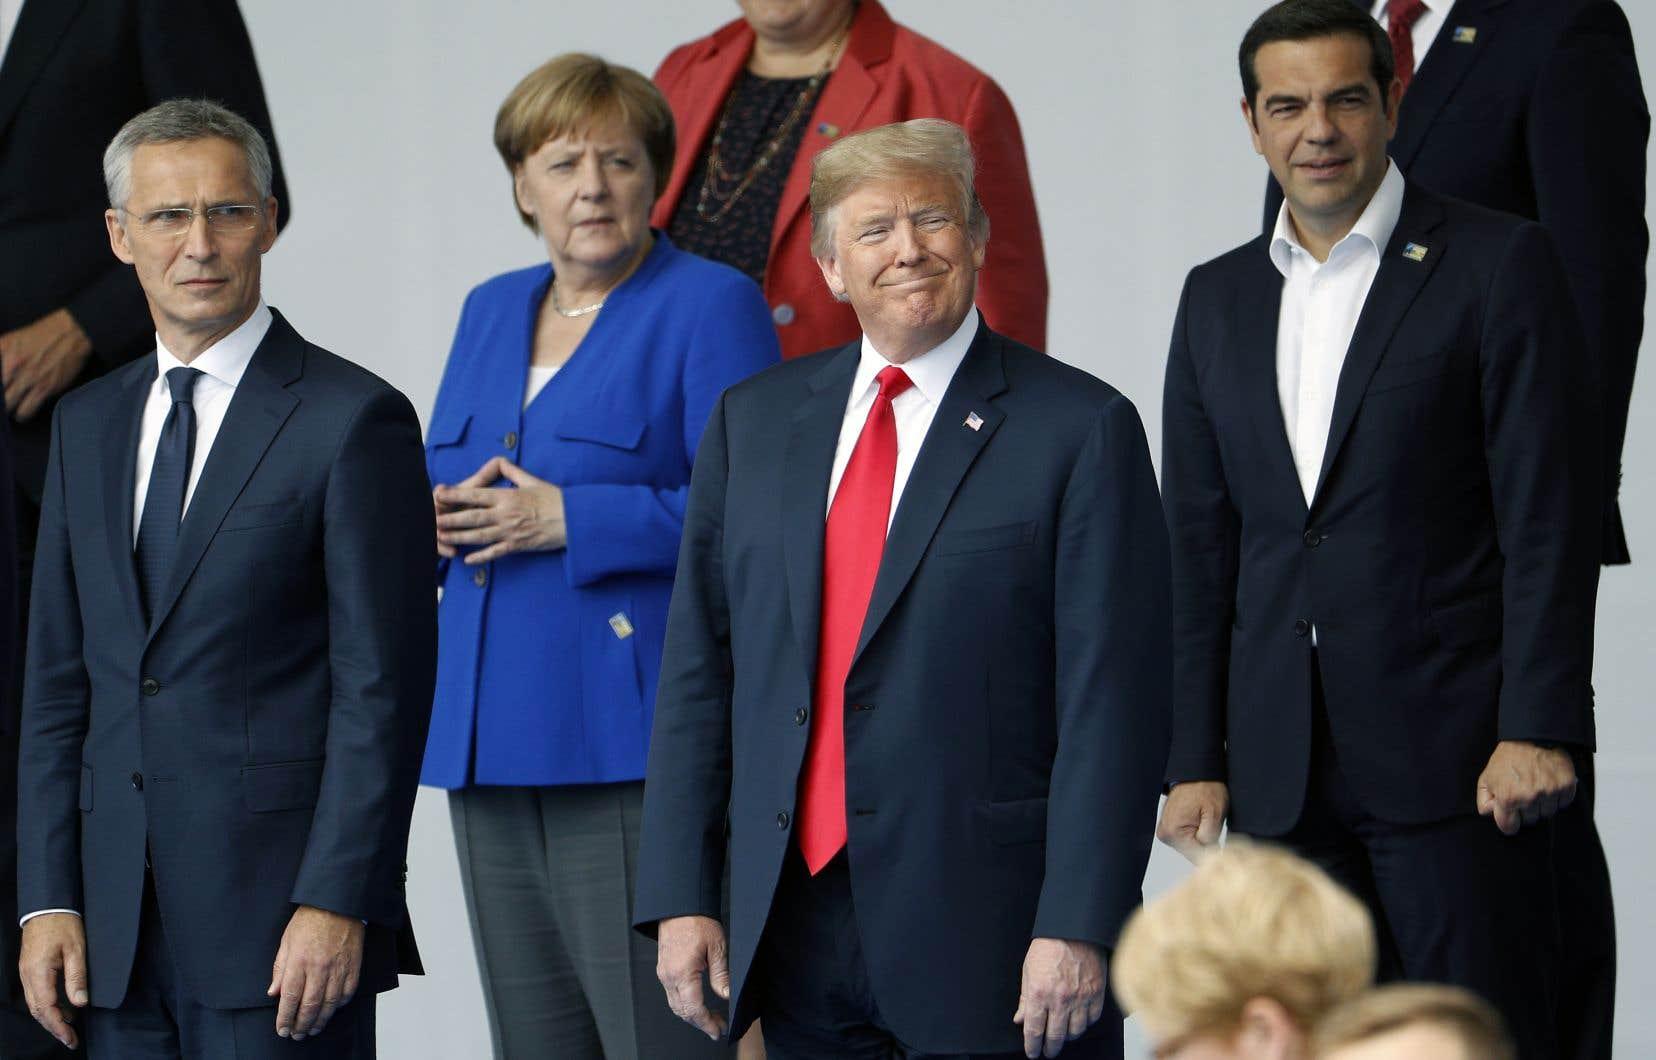 Angela Merkel et Donald Trump au sommet de l'OTAN, mercredi